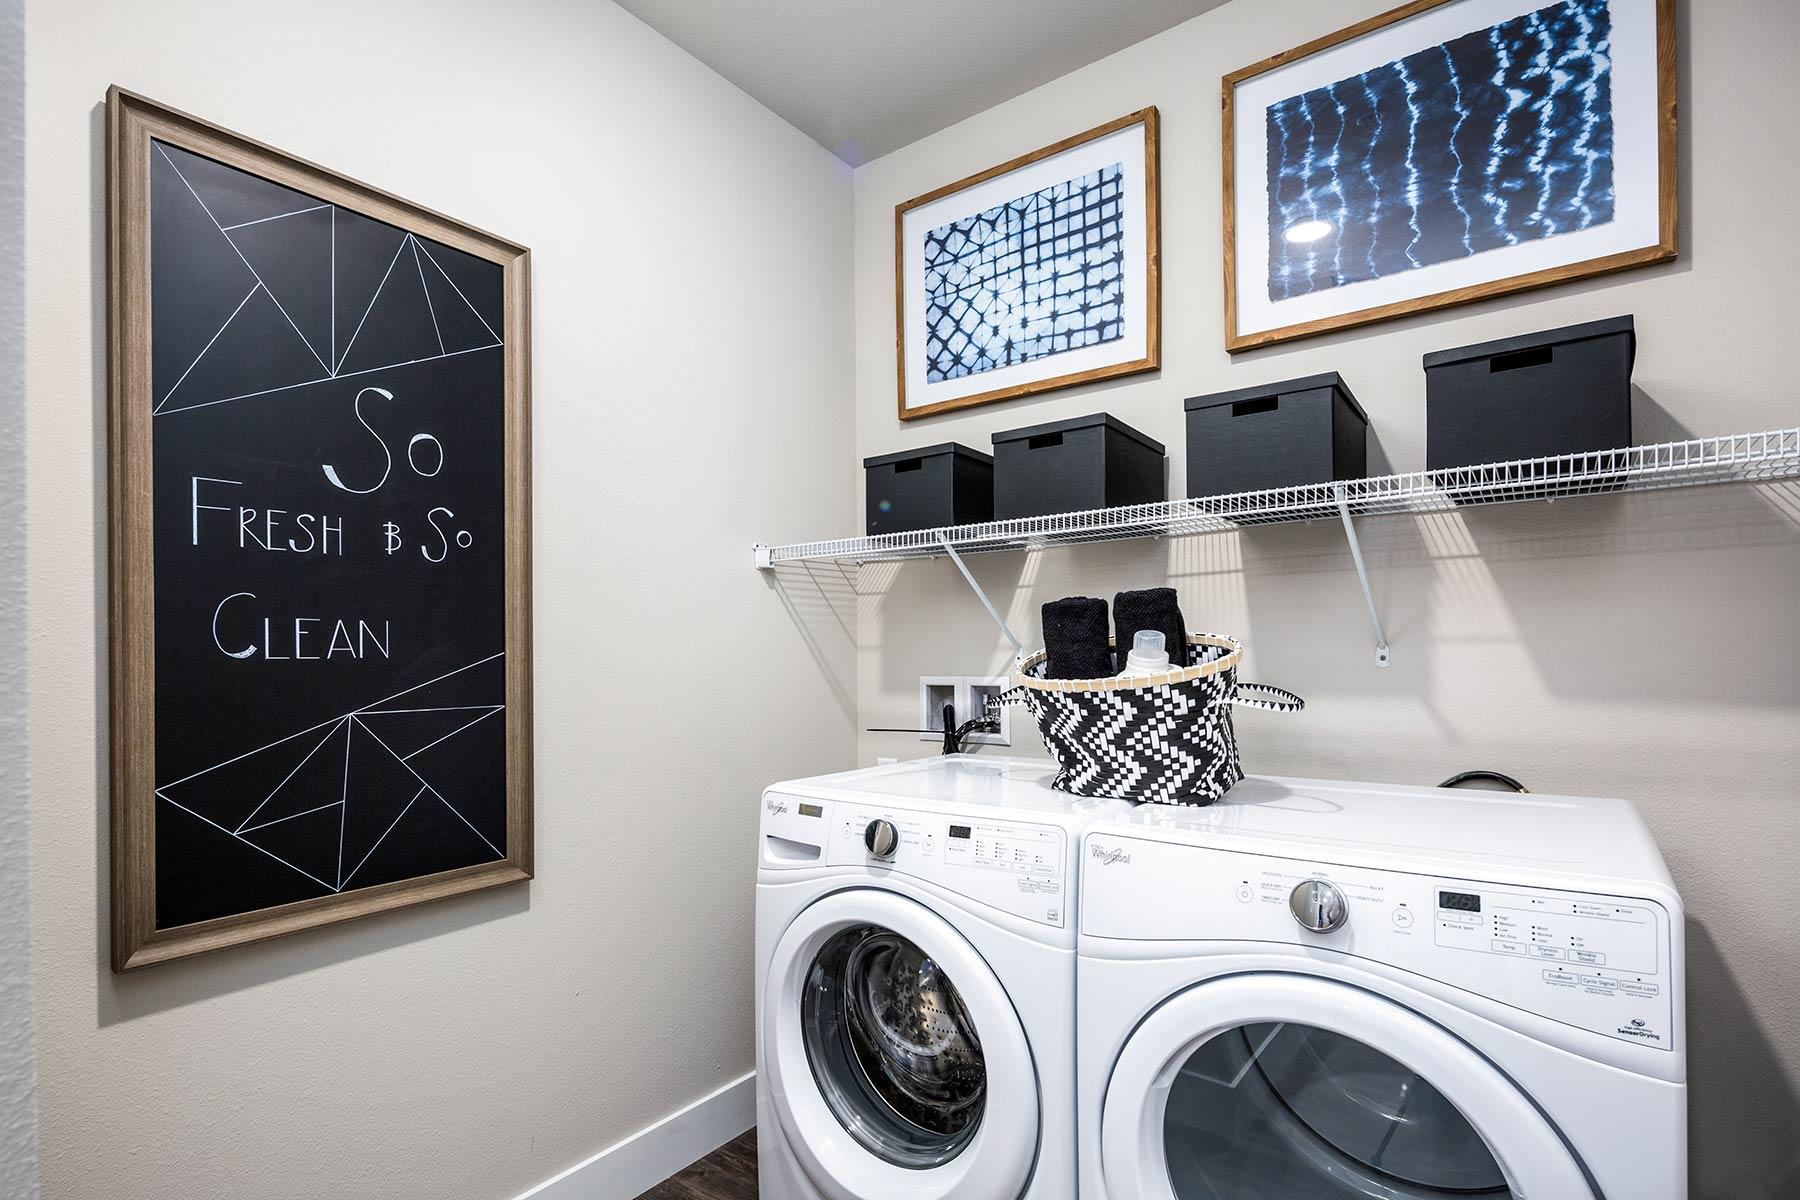 03-In-Home Washer _ Dryer.jpg